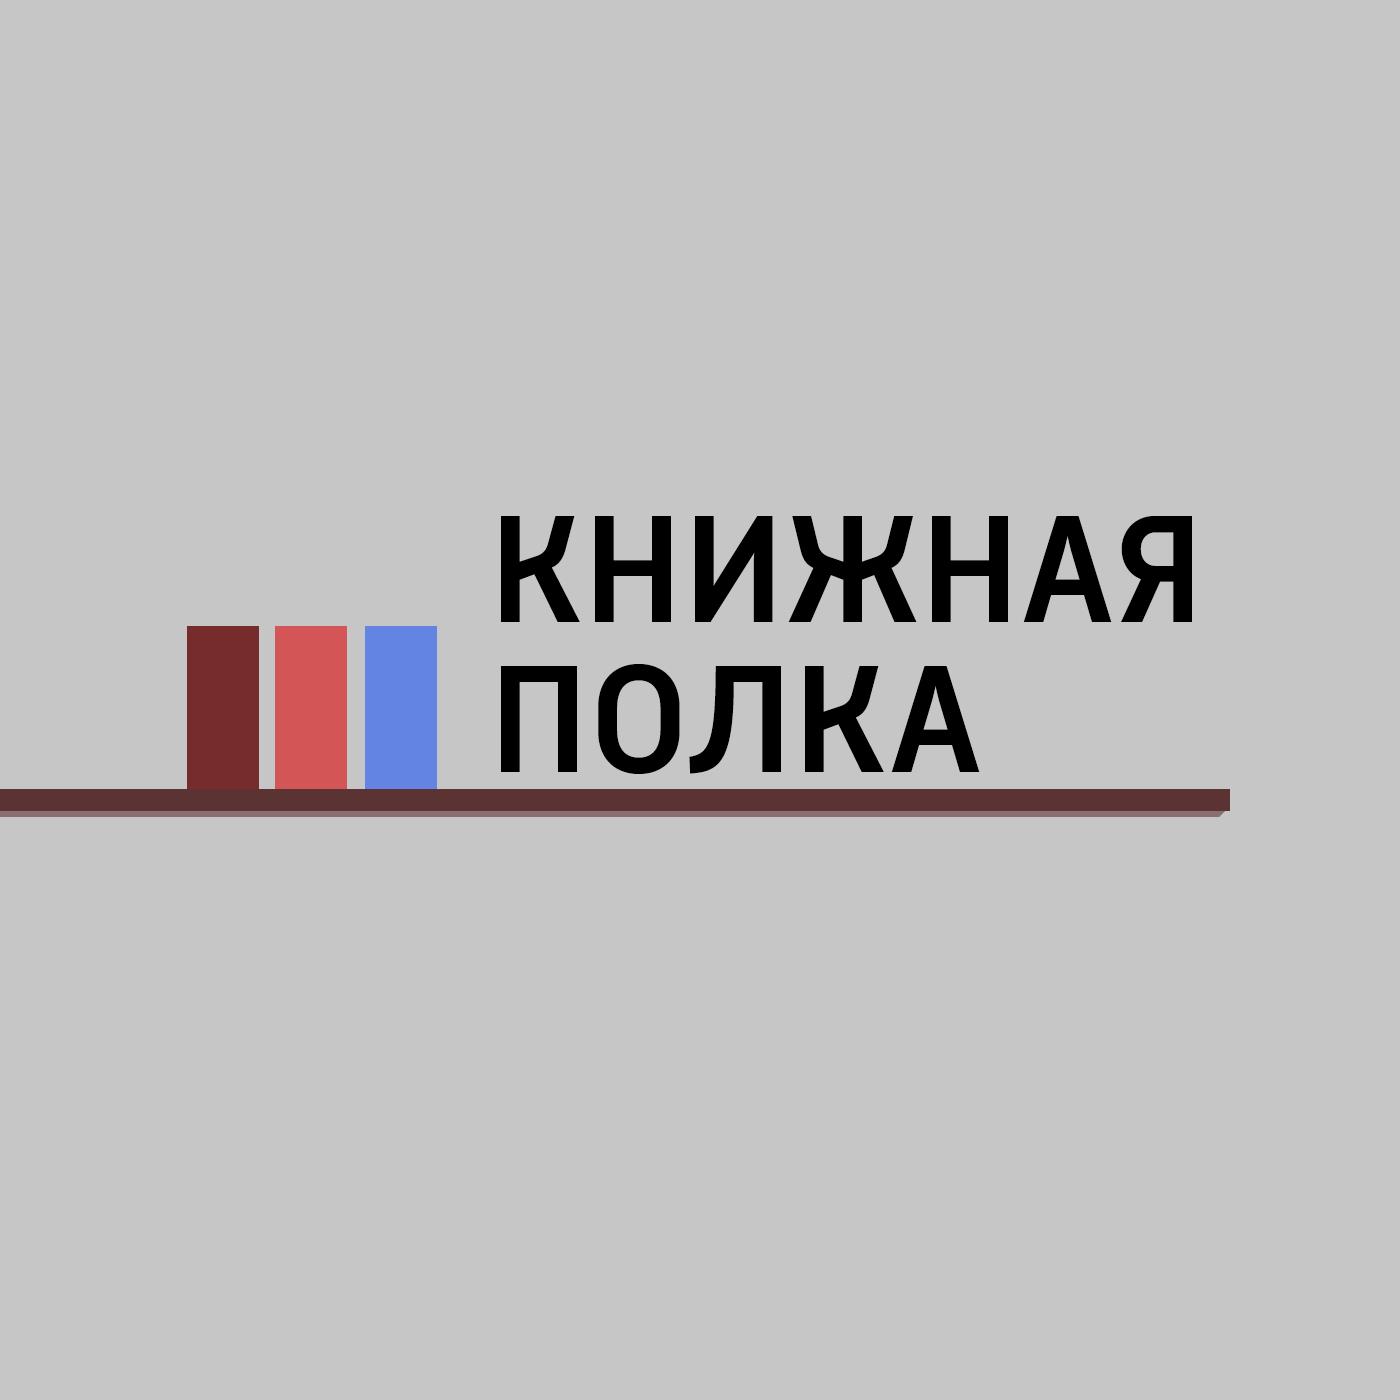 Маргарита Митрофанова Ю Несбё, Татьяна Толстая, Феликс Пальма цена